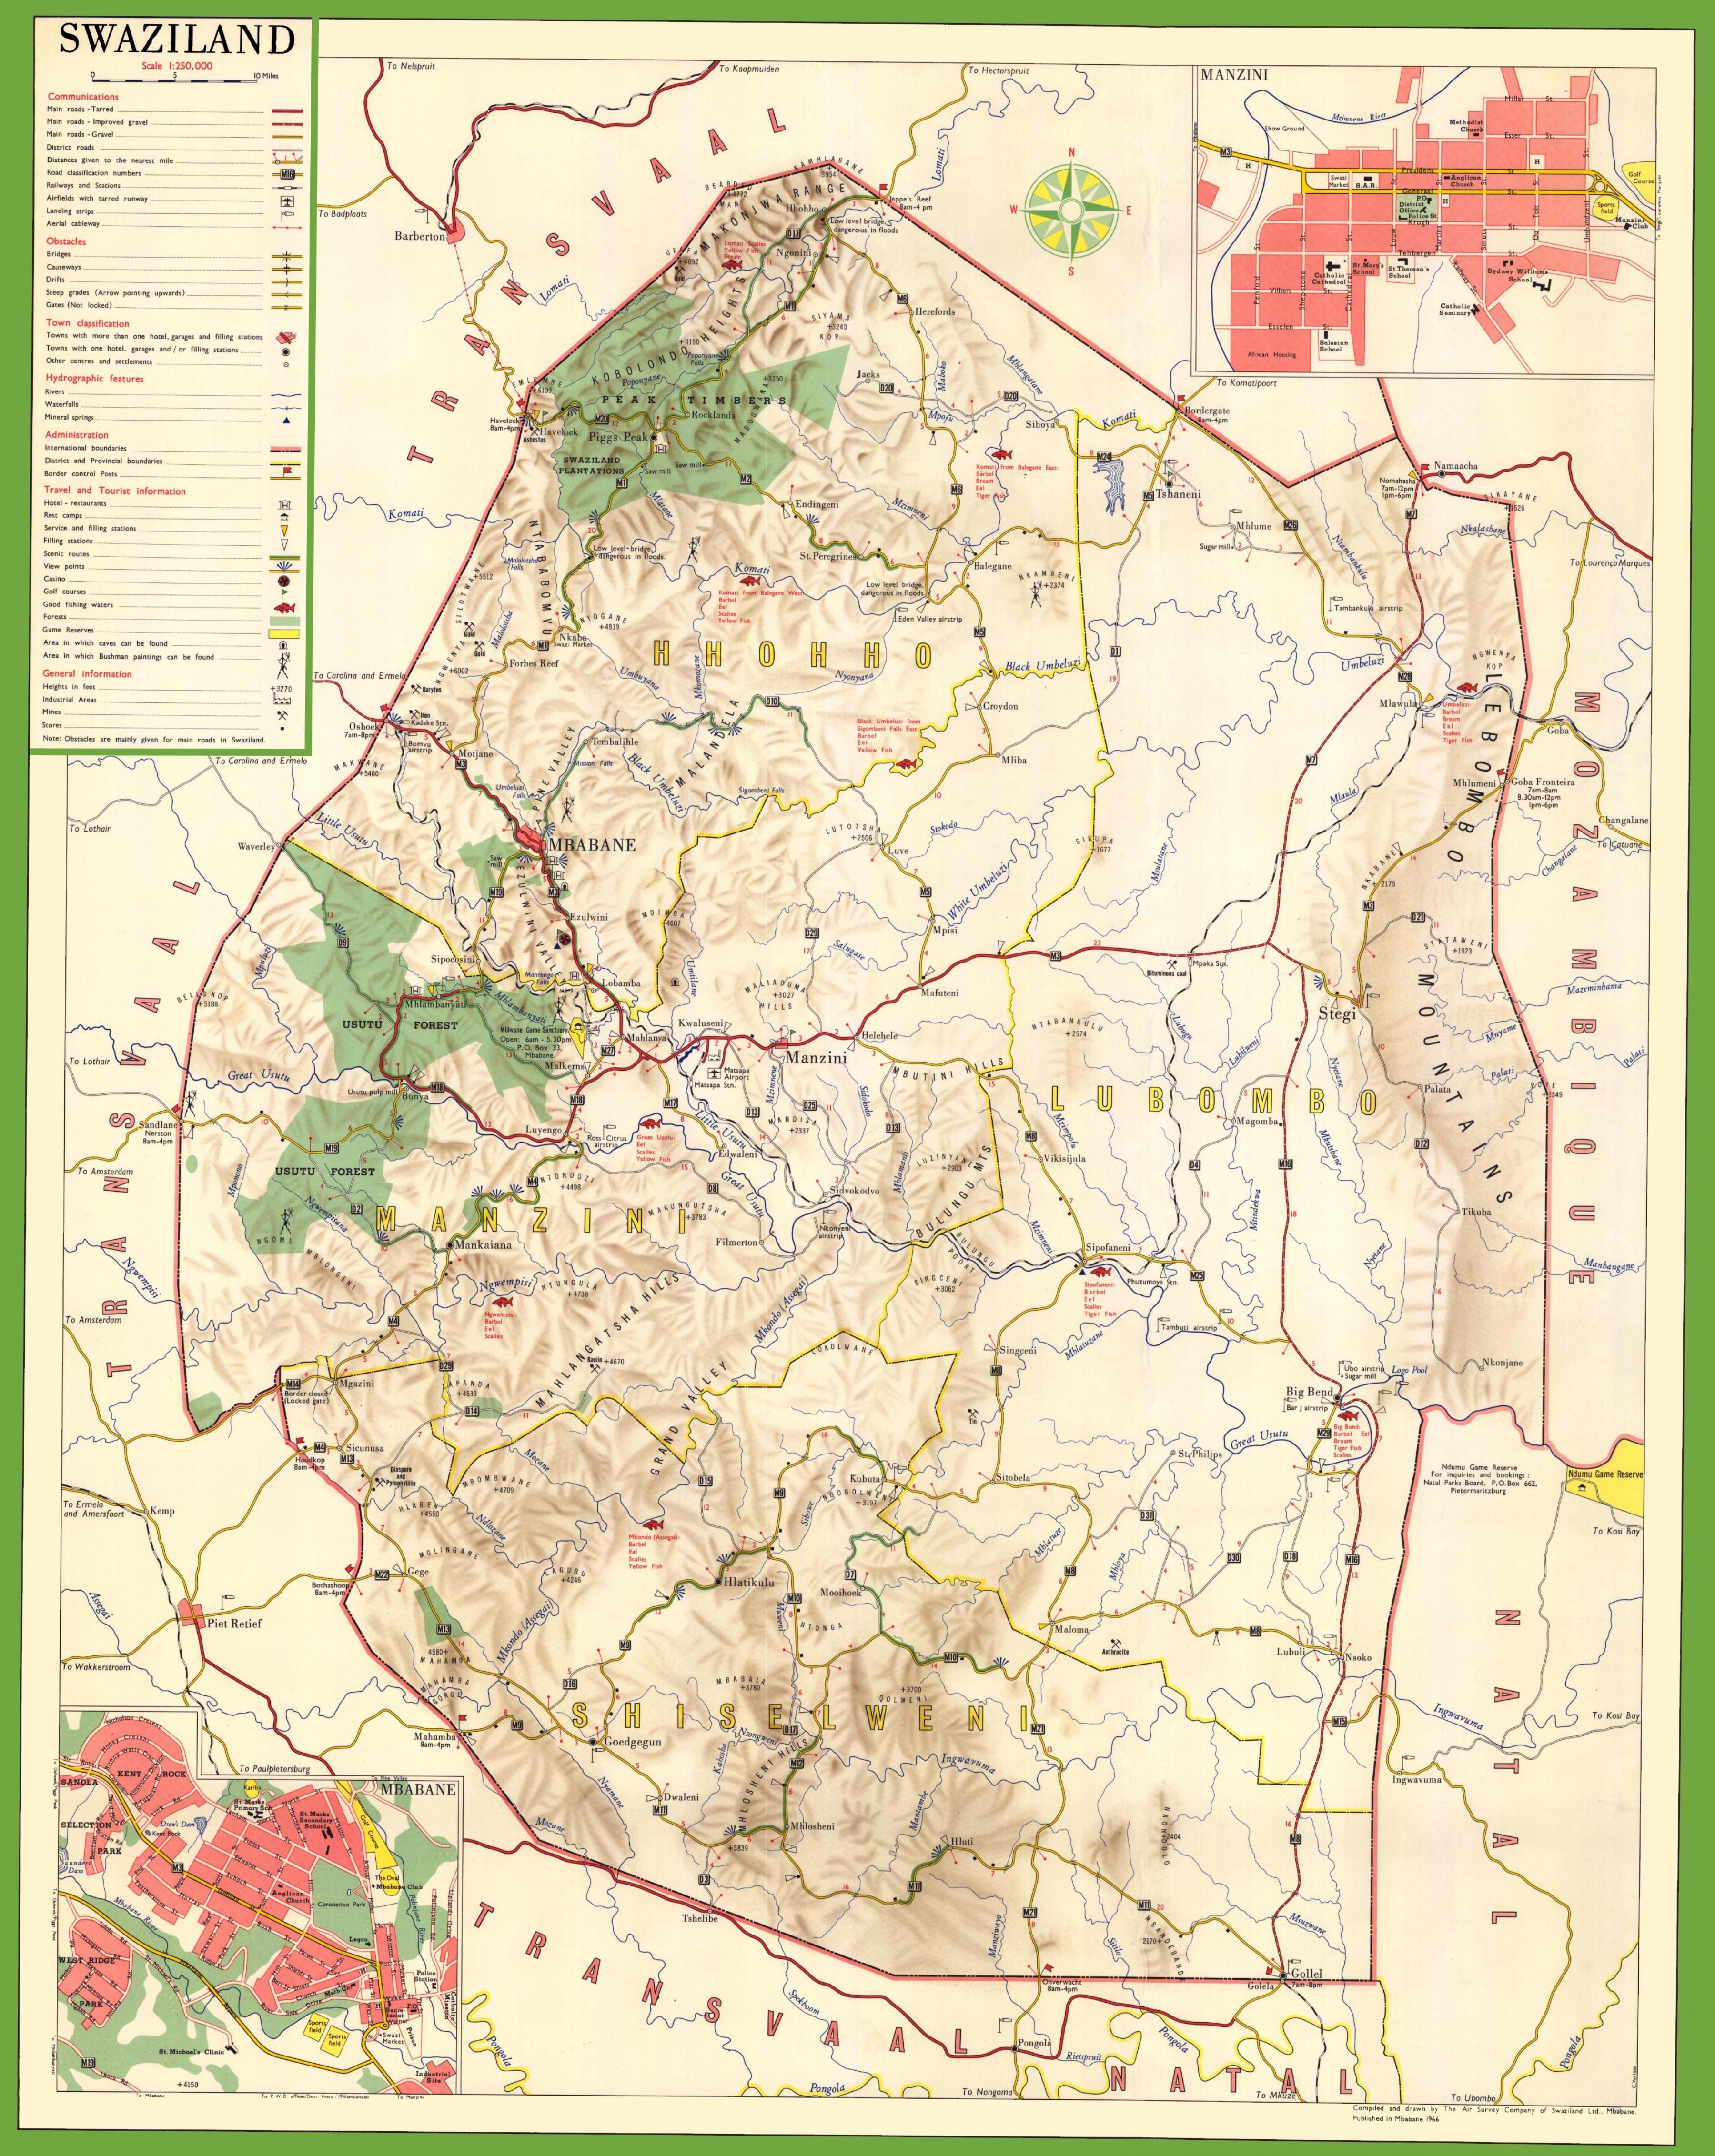 detaljert kart Swaziland detaljert kart   Kart over Swaziland detaljert (Sør  detaljert kart